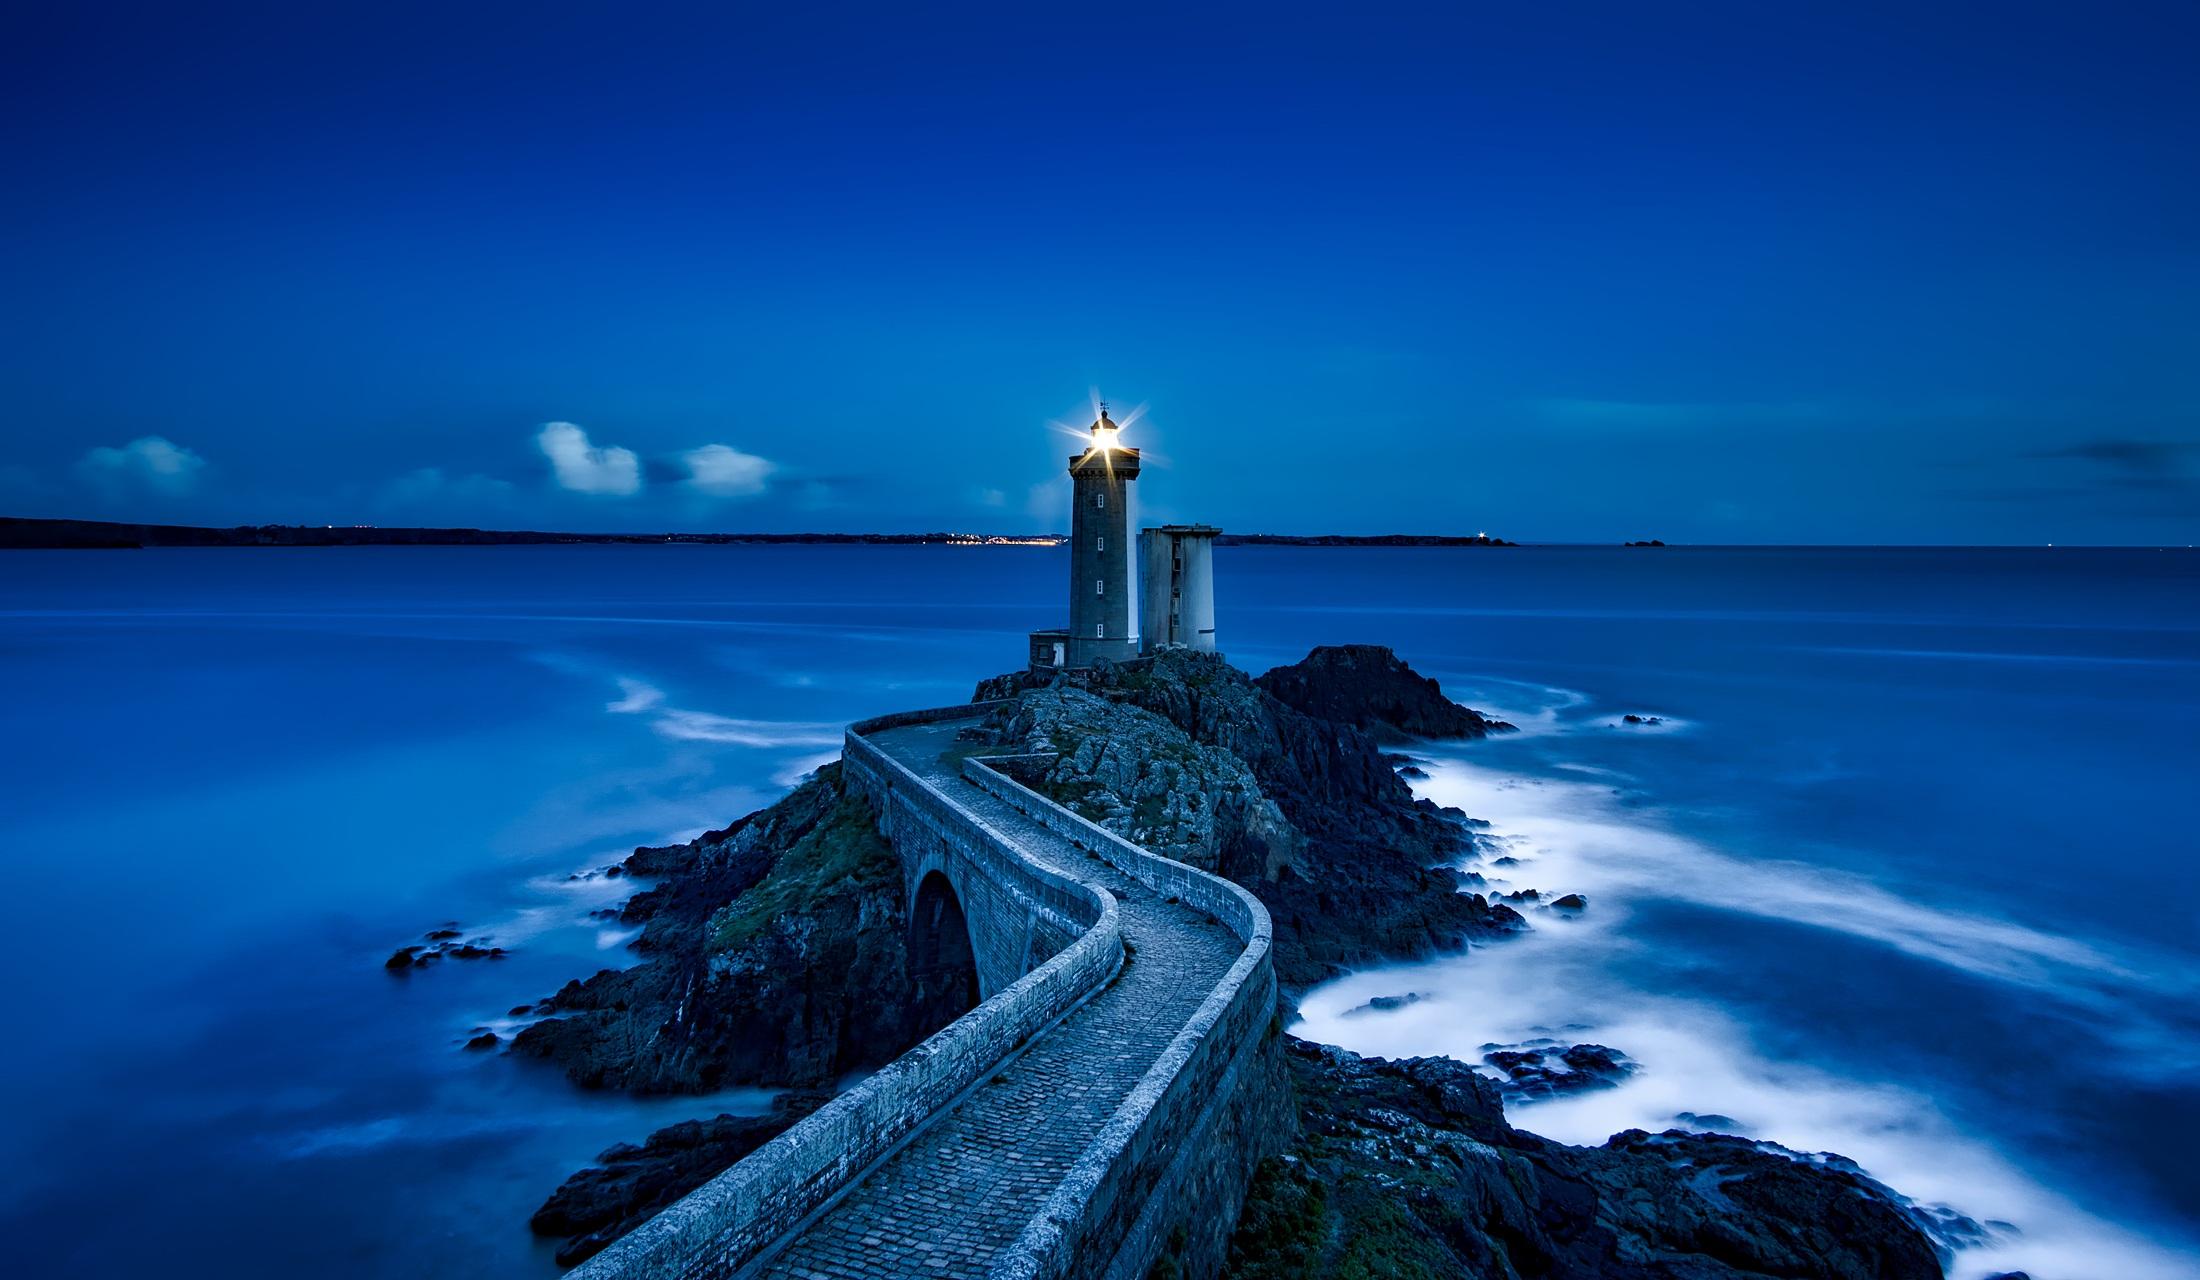 море света картинки интересны